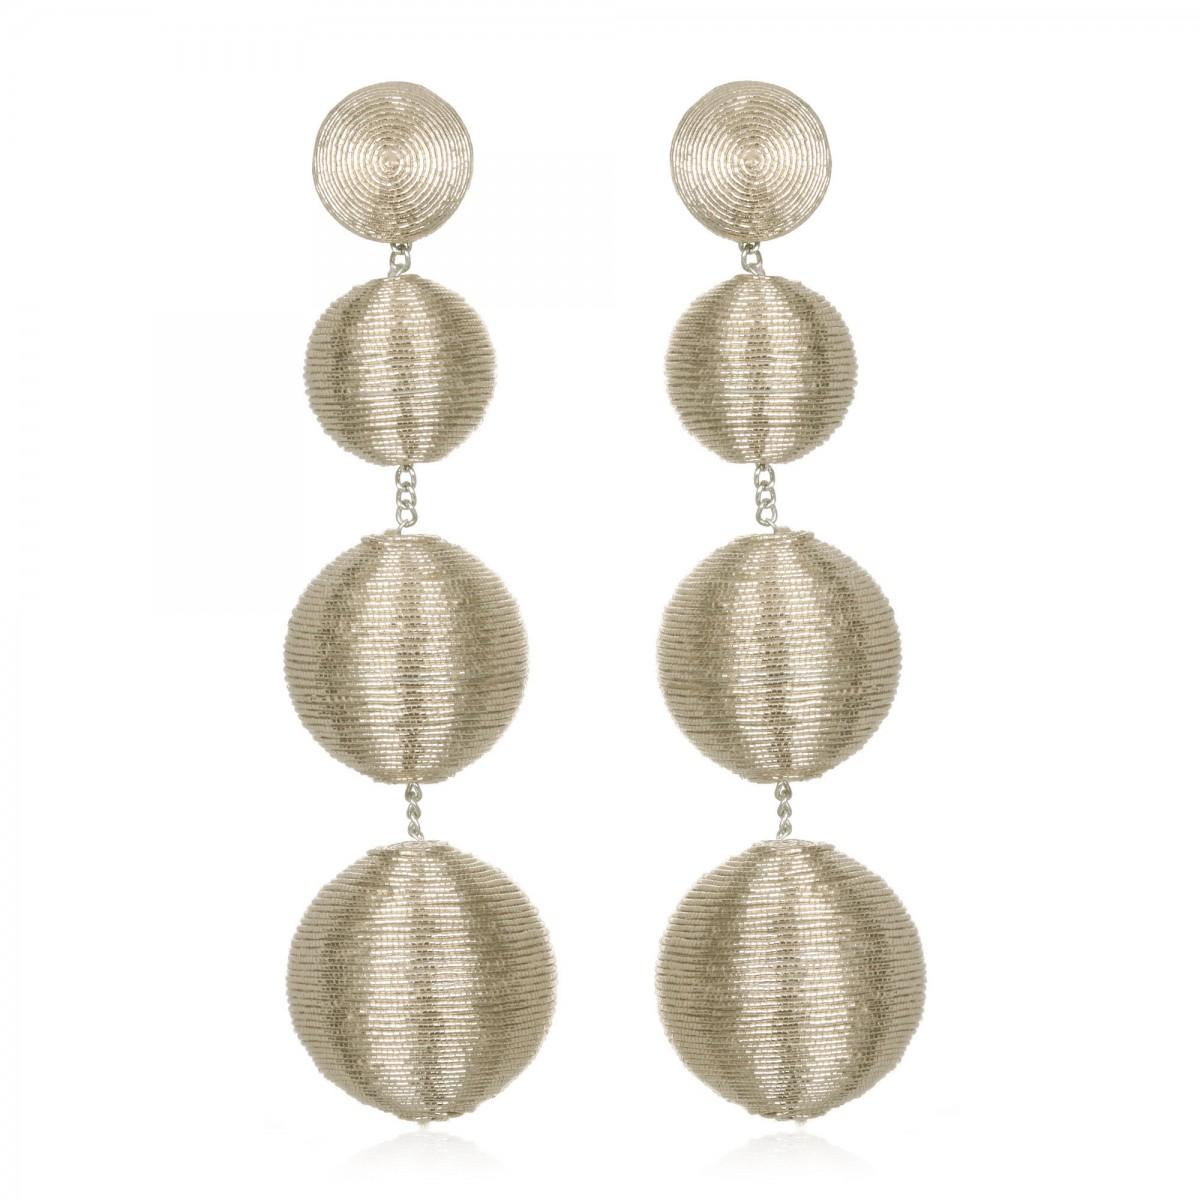 Metallic Silver BonBon Earrings by SUZANNA DAI